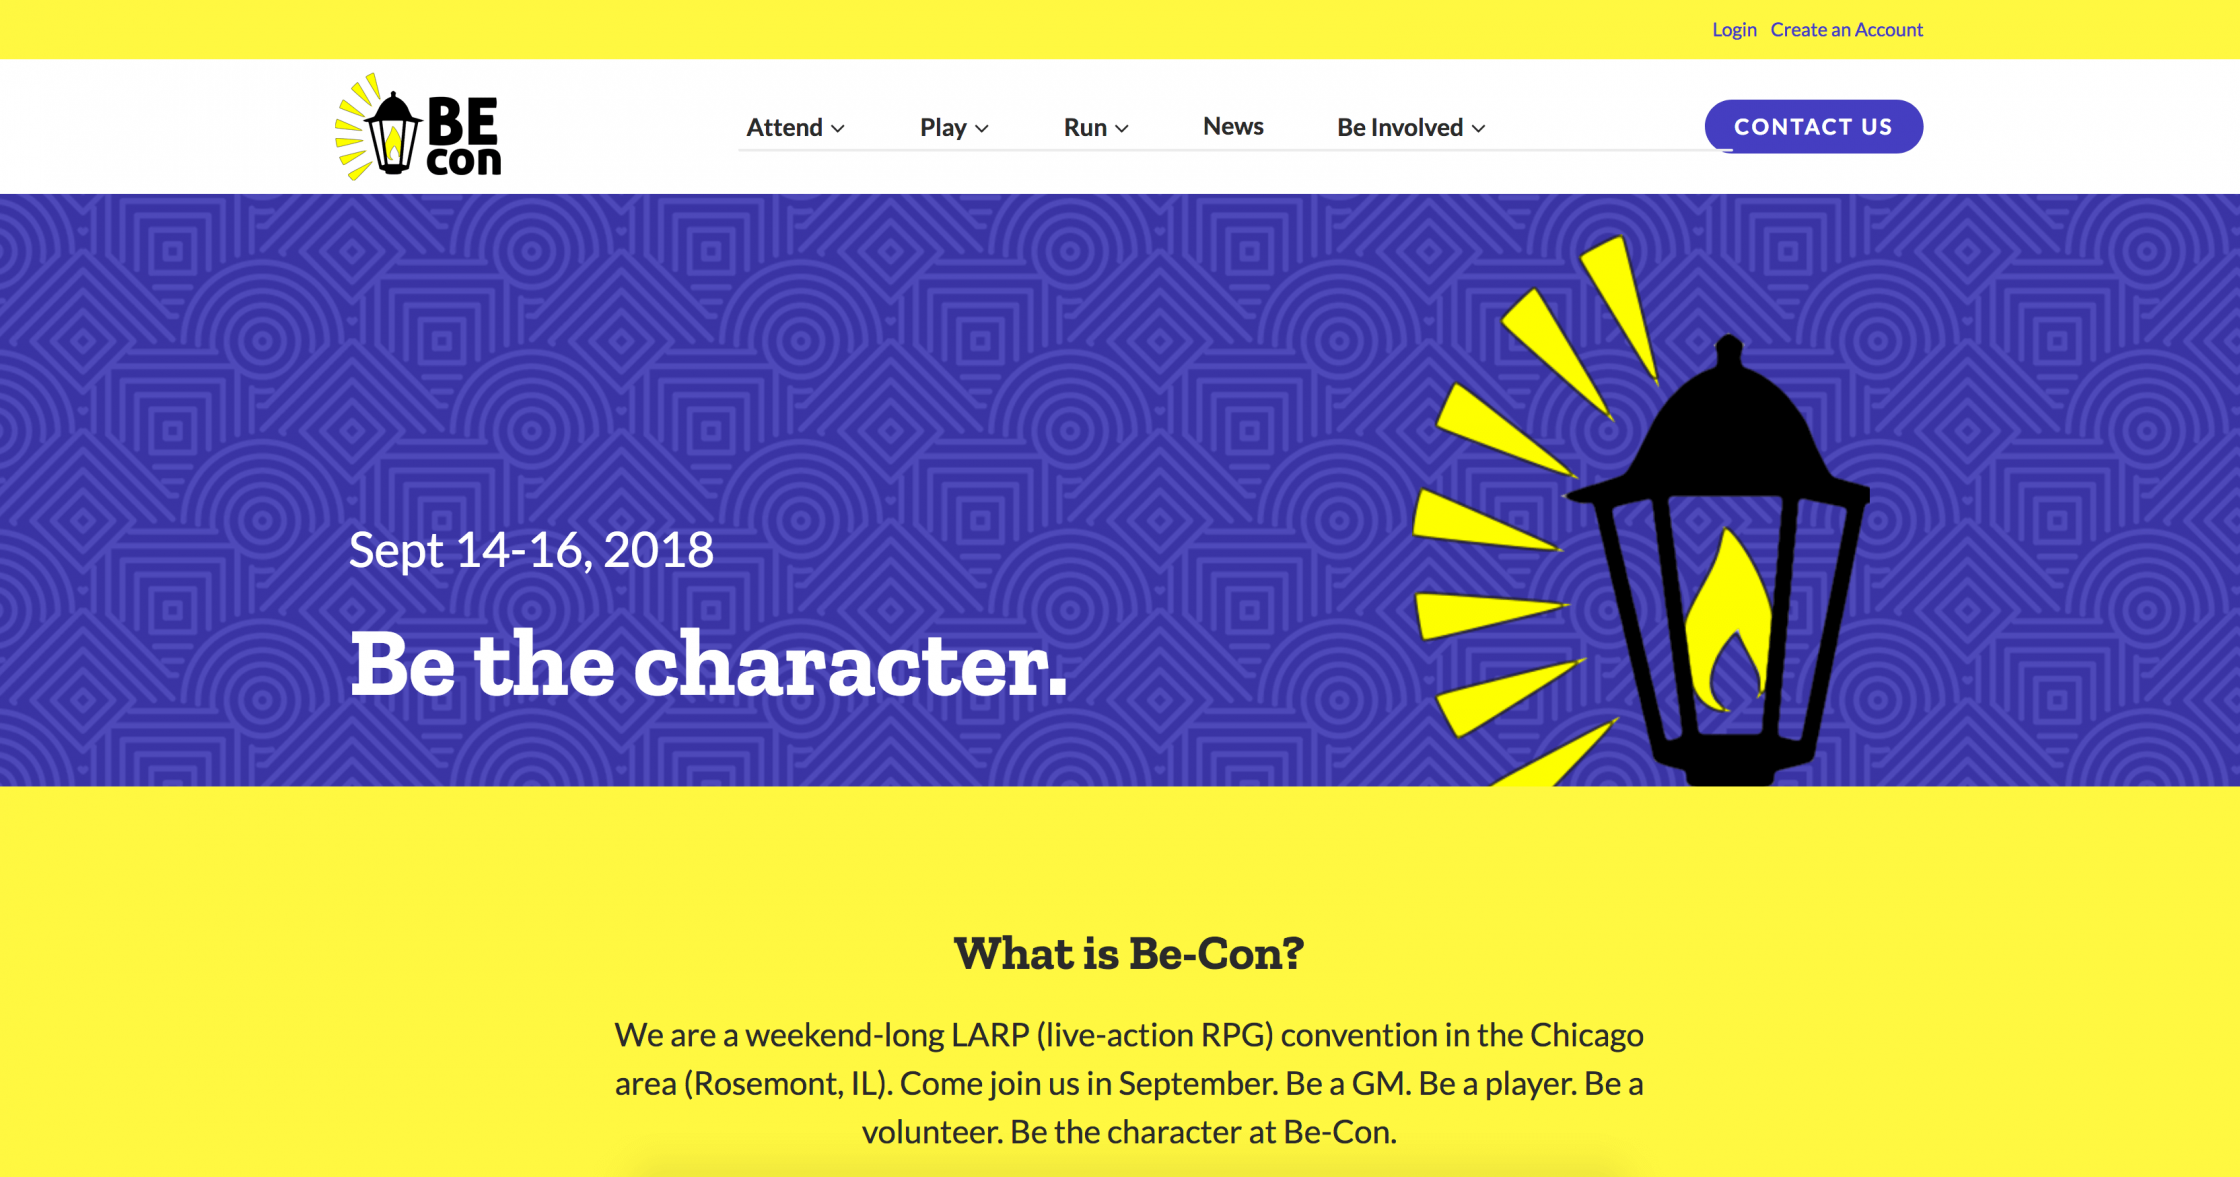 Be-Con homepage screenshot